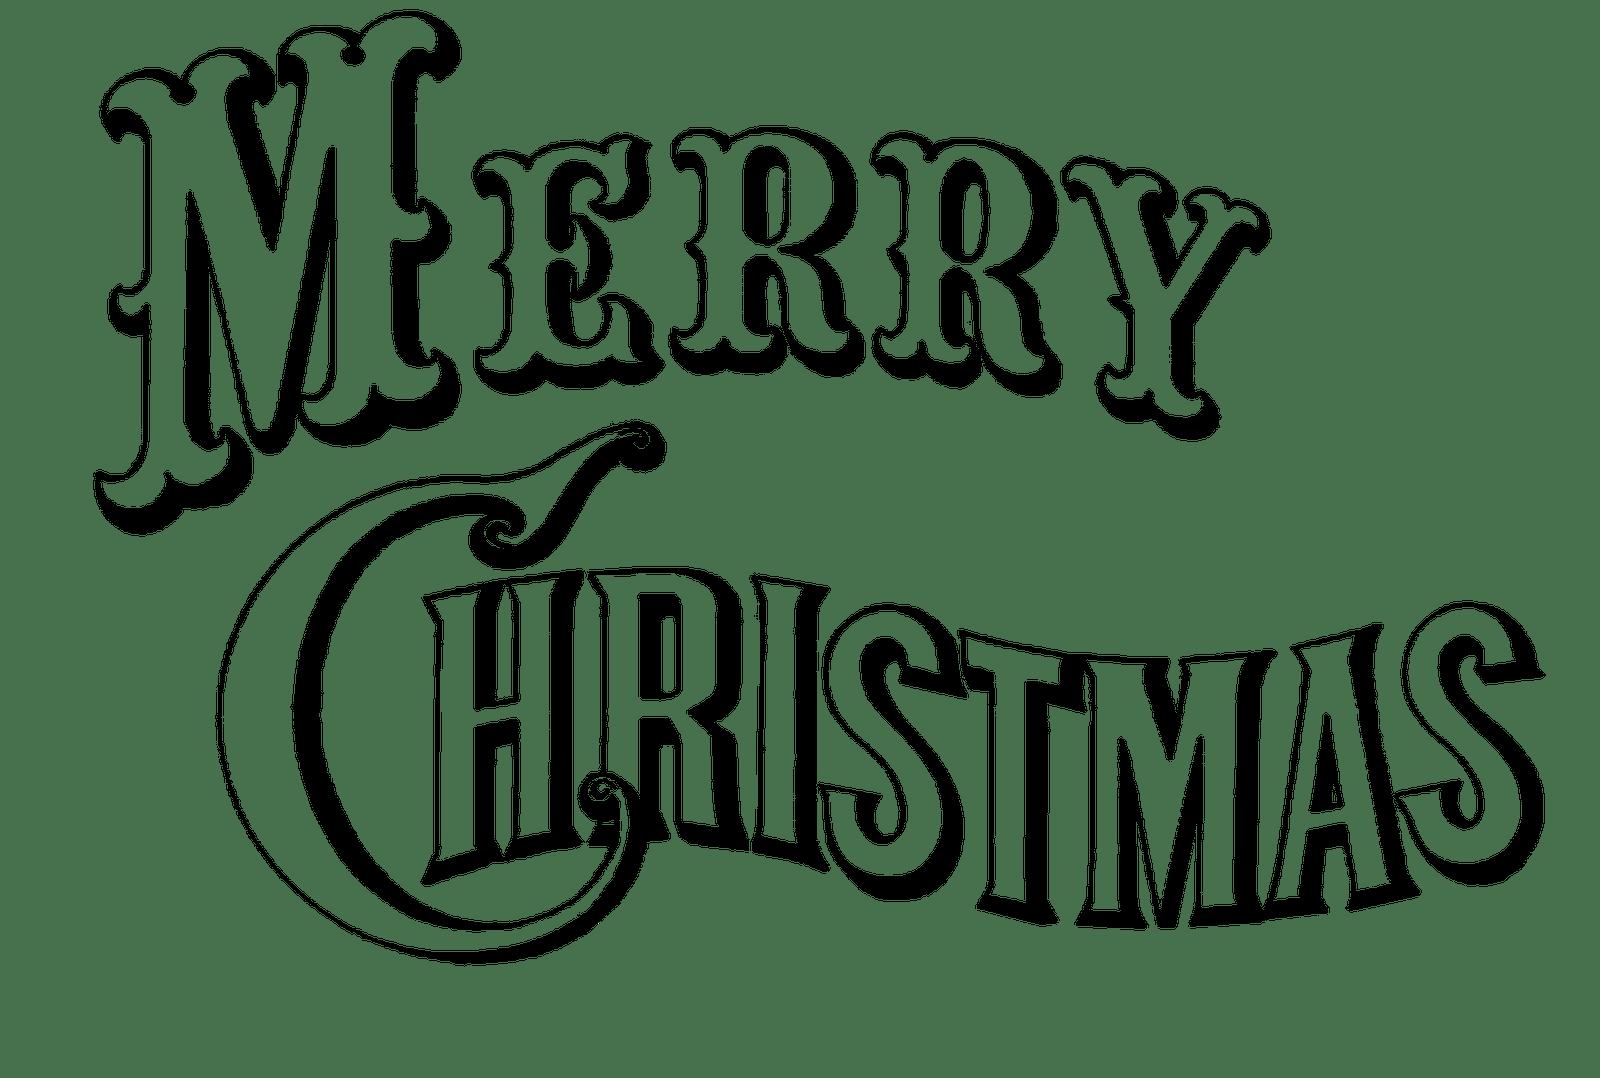 Christian Merry Christmas Clip Clipart Panda